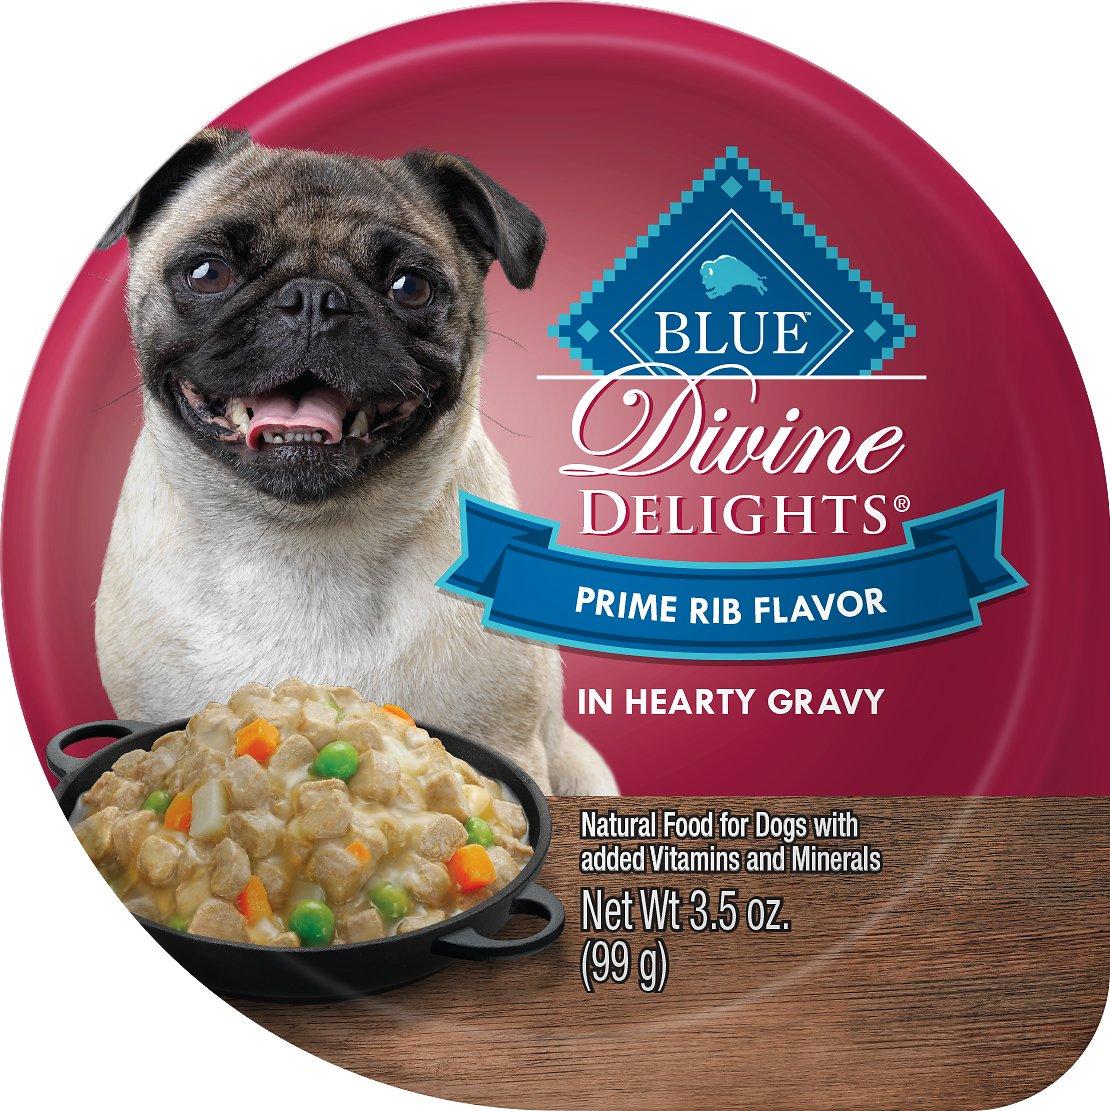 Blue Buffalo Divine Delights Prime Rib Flavor Hearty Gravy Dog Food Trays Image